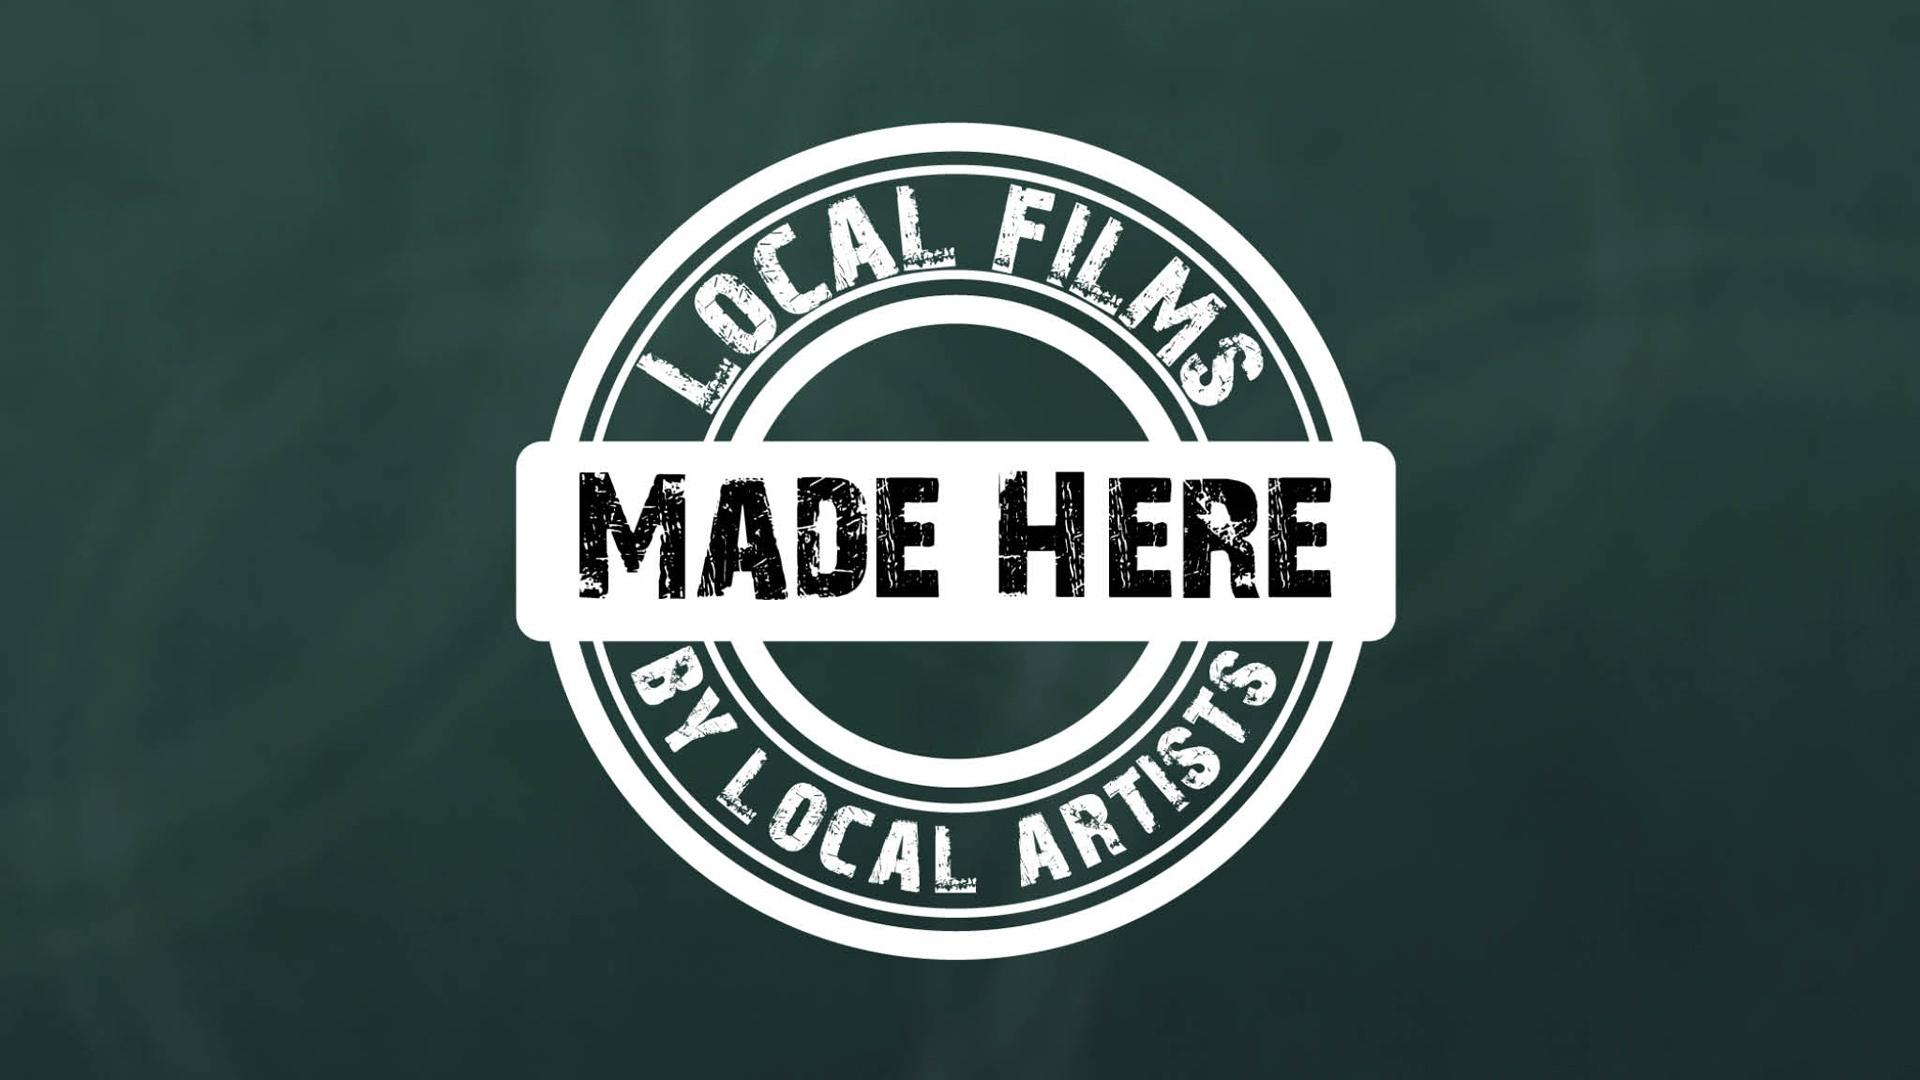 Made Here logo